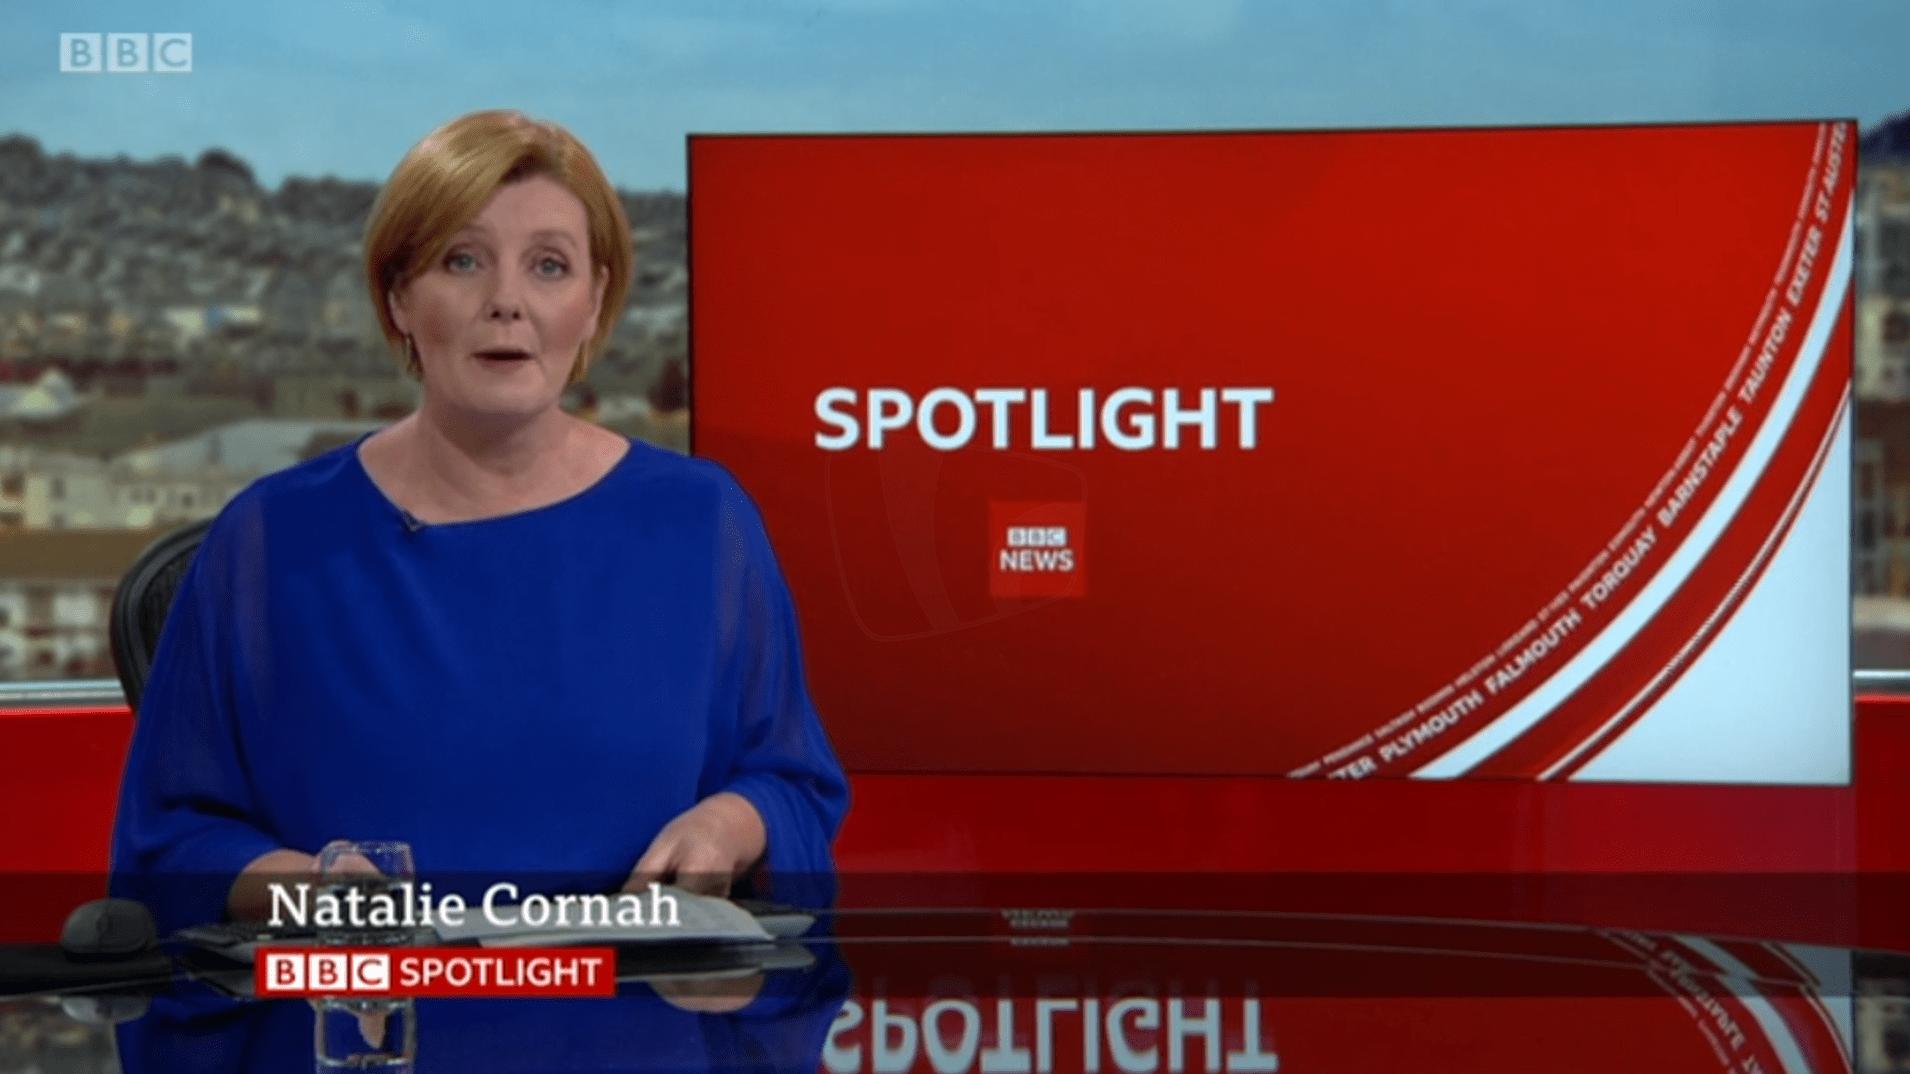 PICTURED: BBC Spotlight studio presentation and lower-third. Presenter: Natalie Cornah